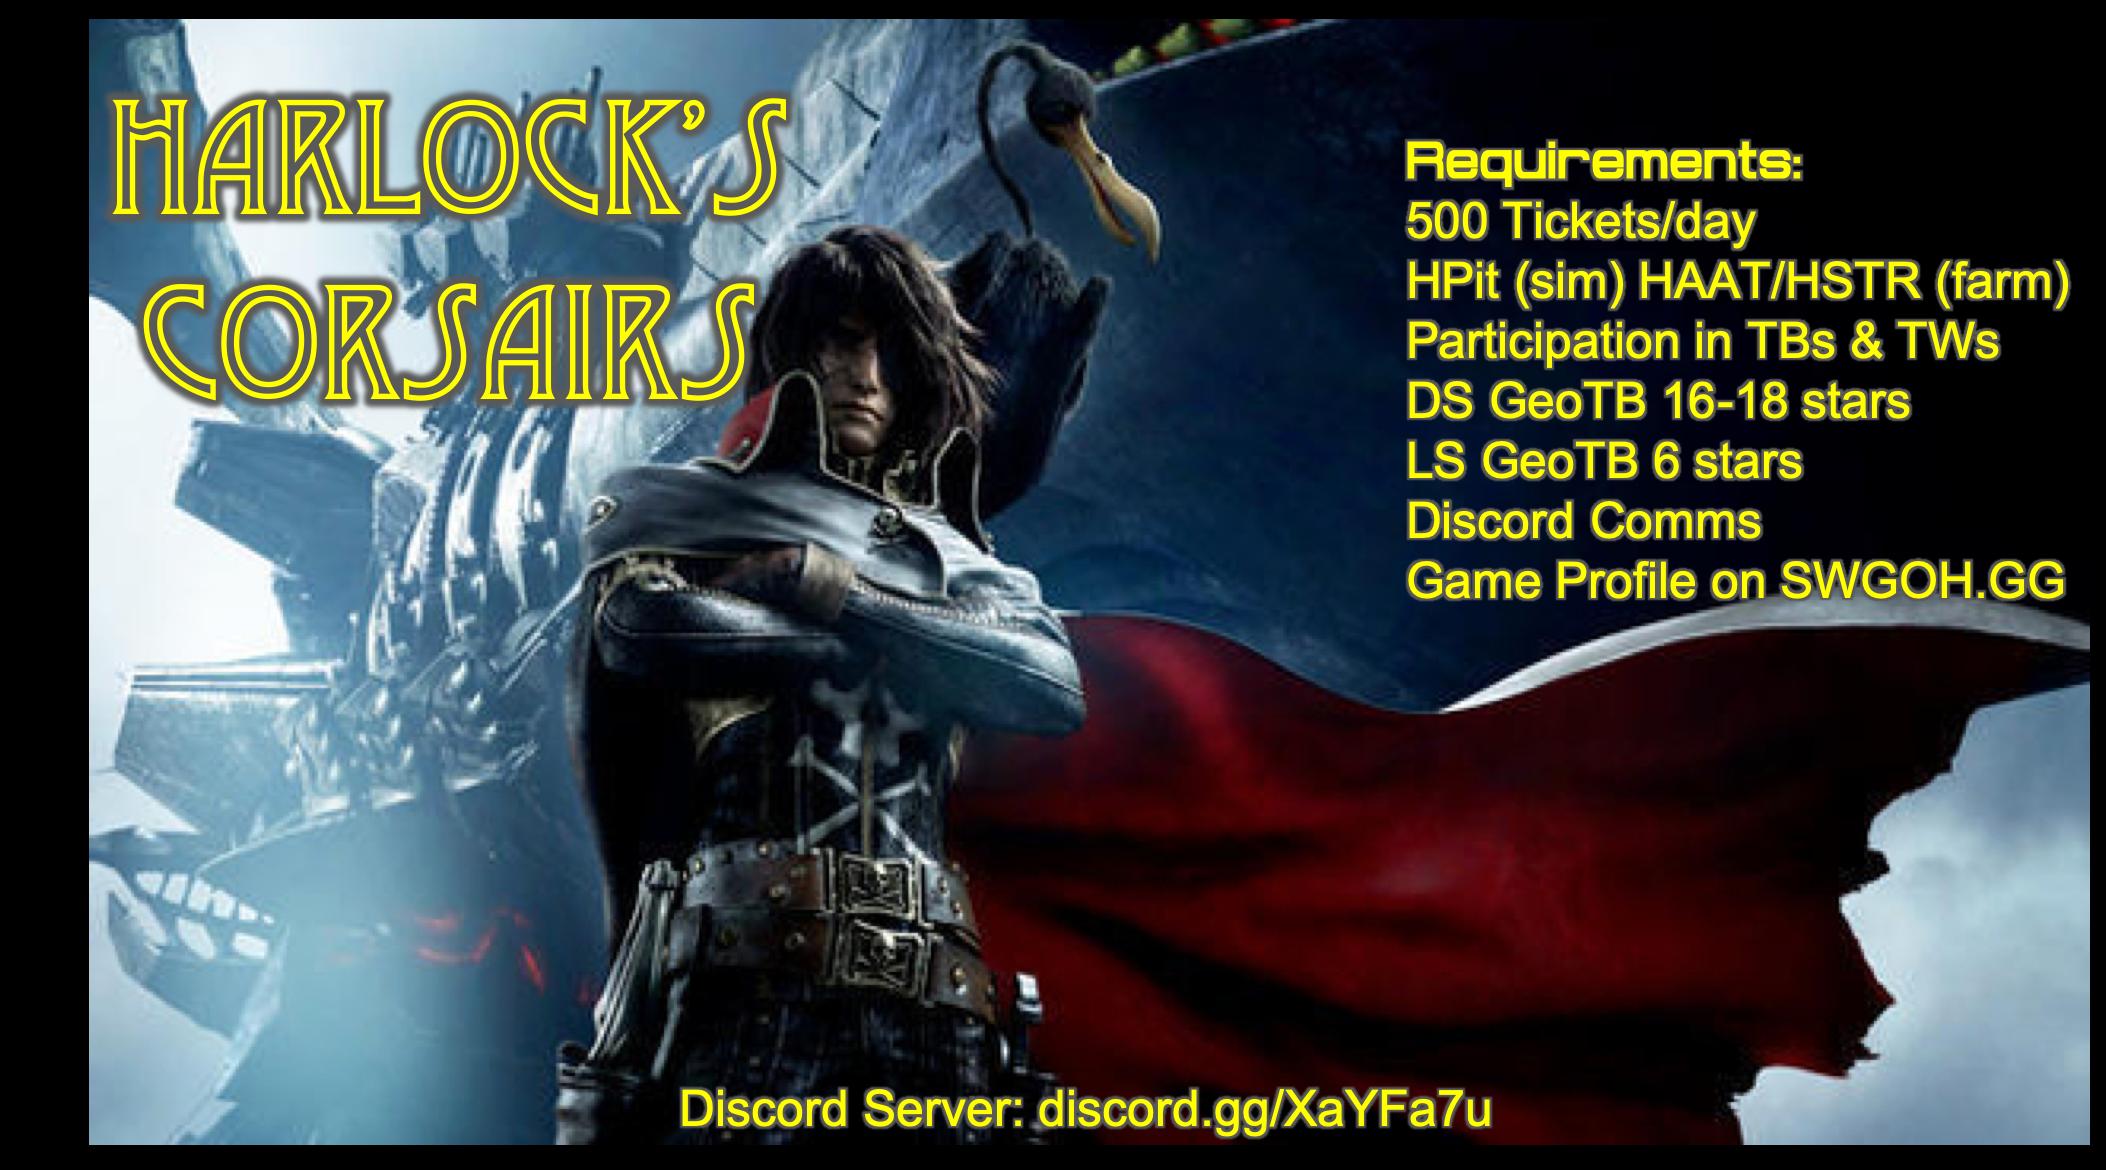 Harlocks_Corsairs_guild_poster_II_mirror_reverse.png